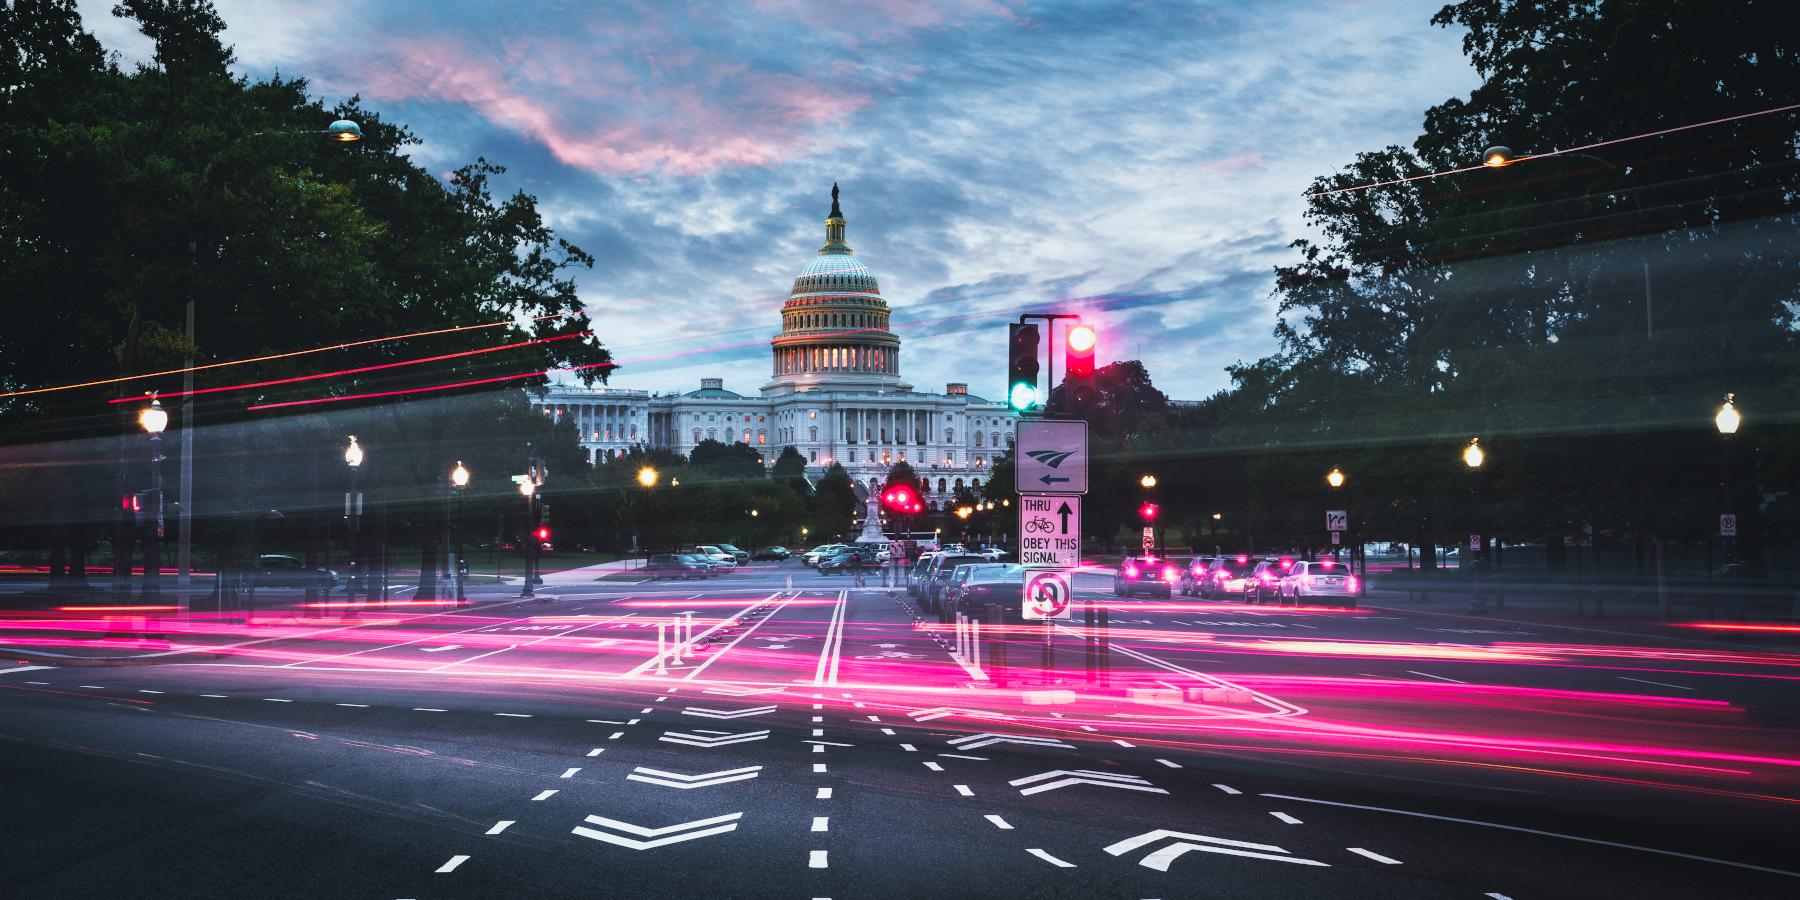 venturebeat.com - Khari Johnson - How U.S. tech policy could change if Democrats win back the Senate